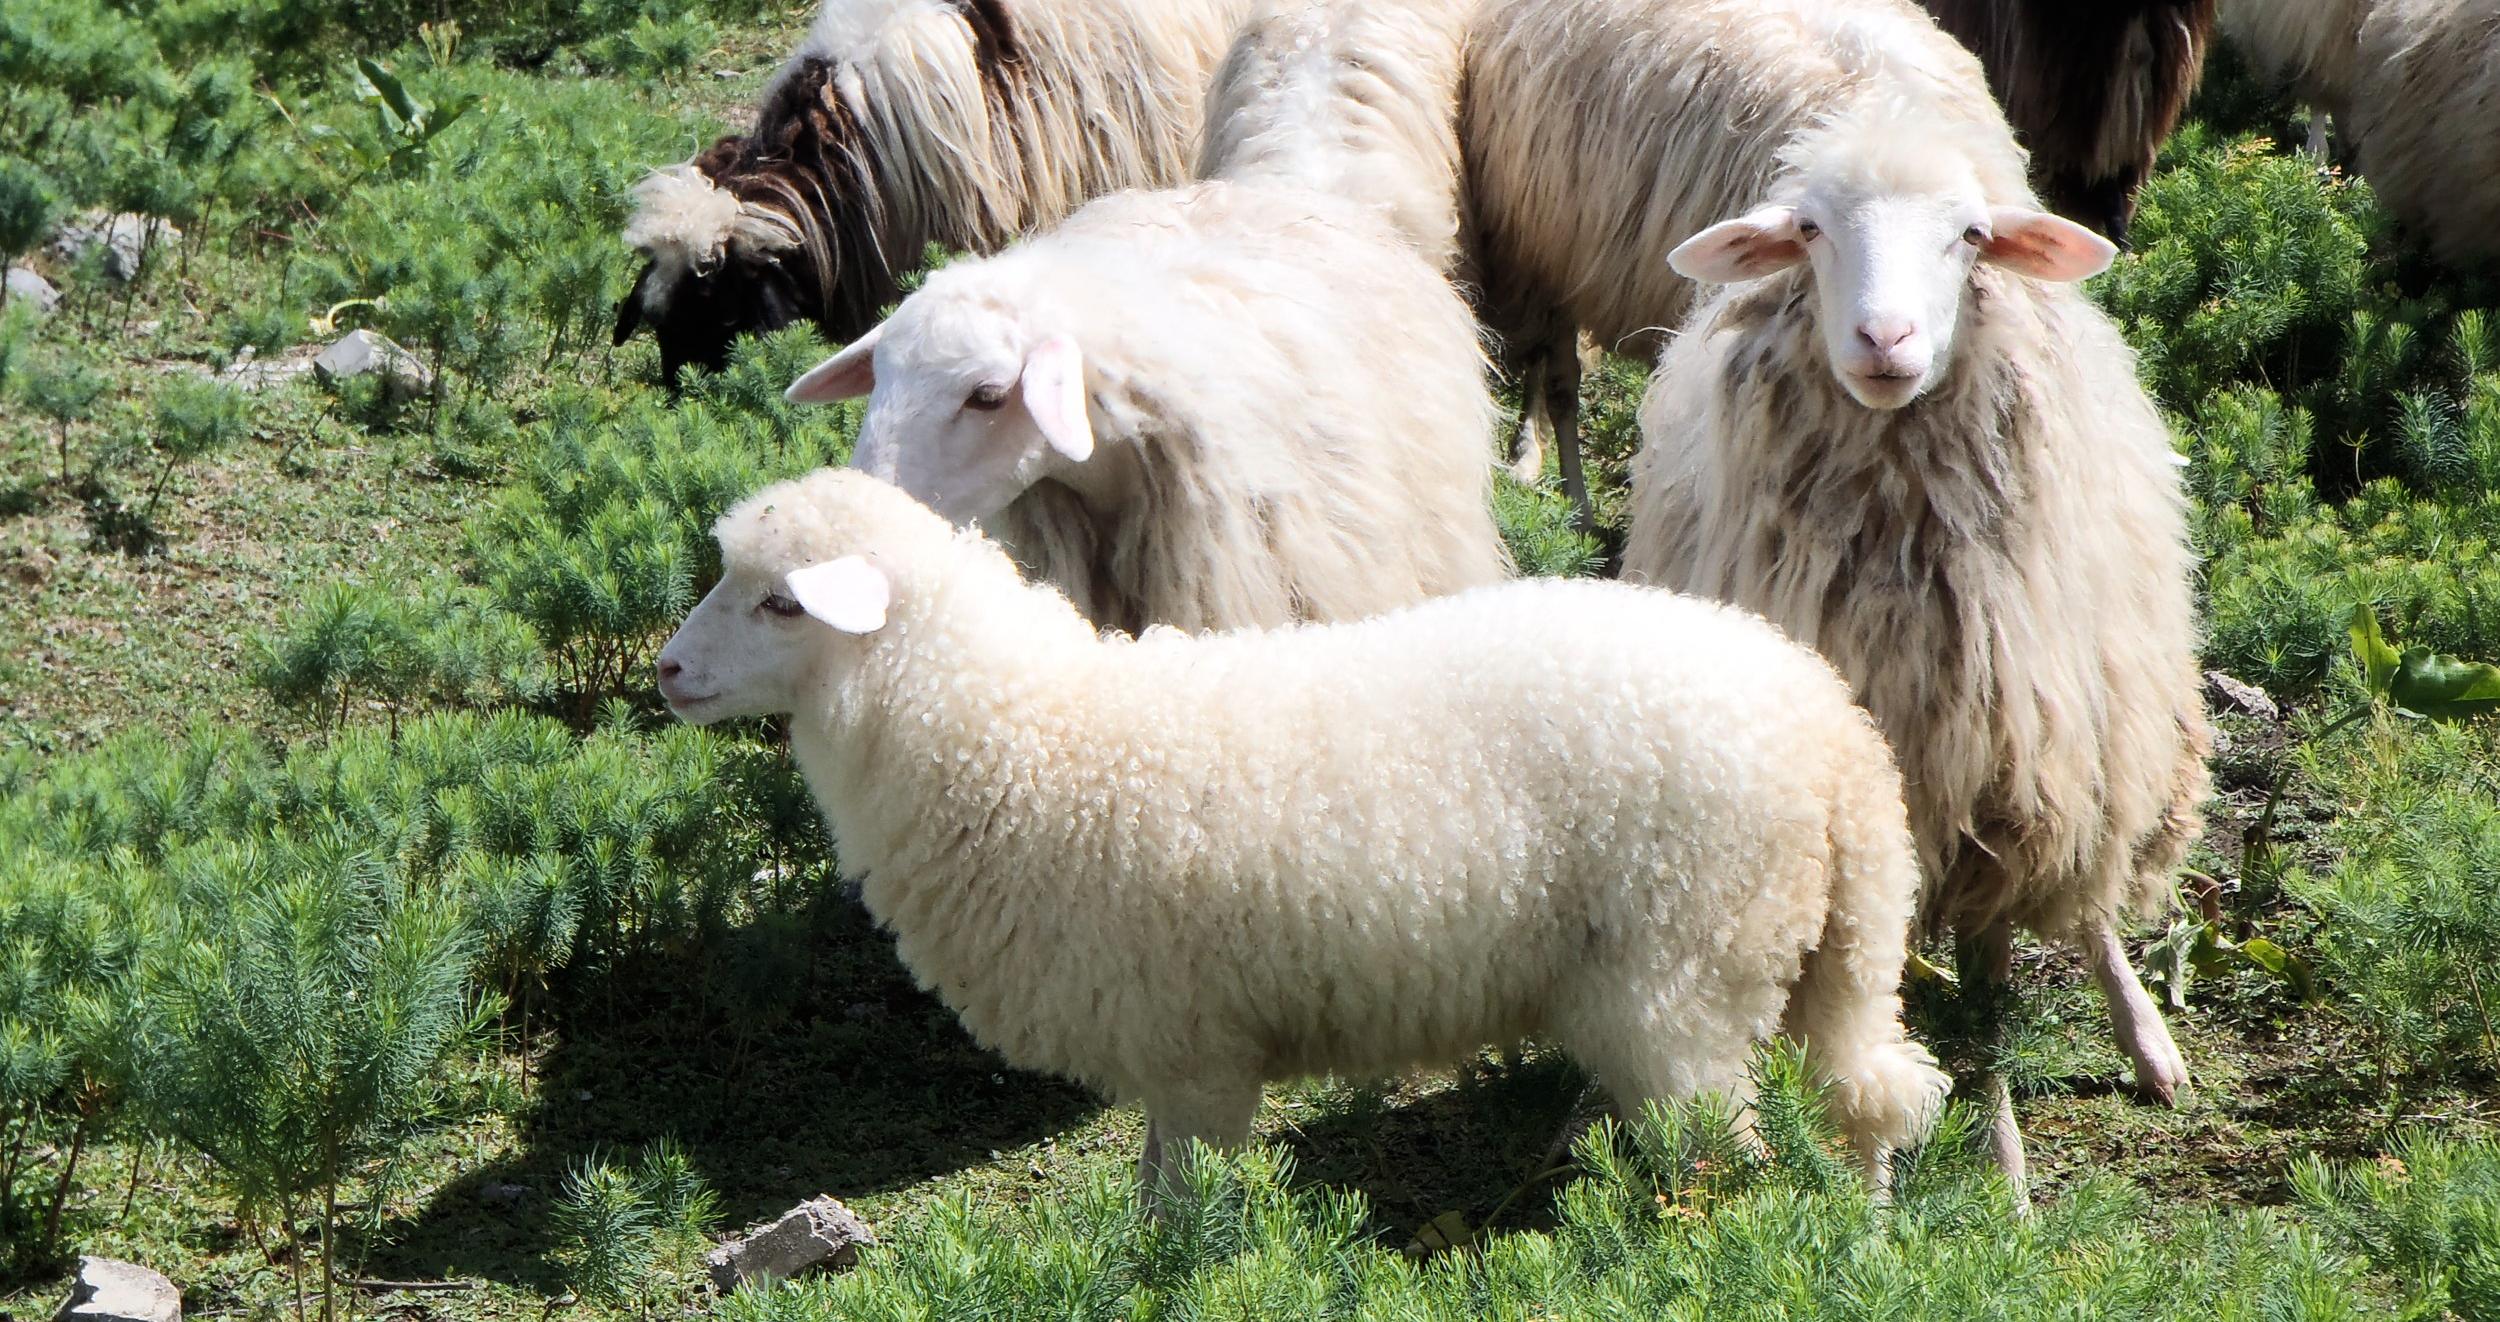 Sheep are cute ok.